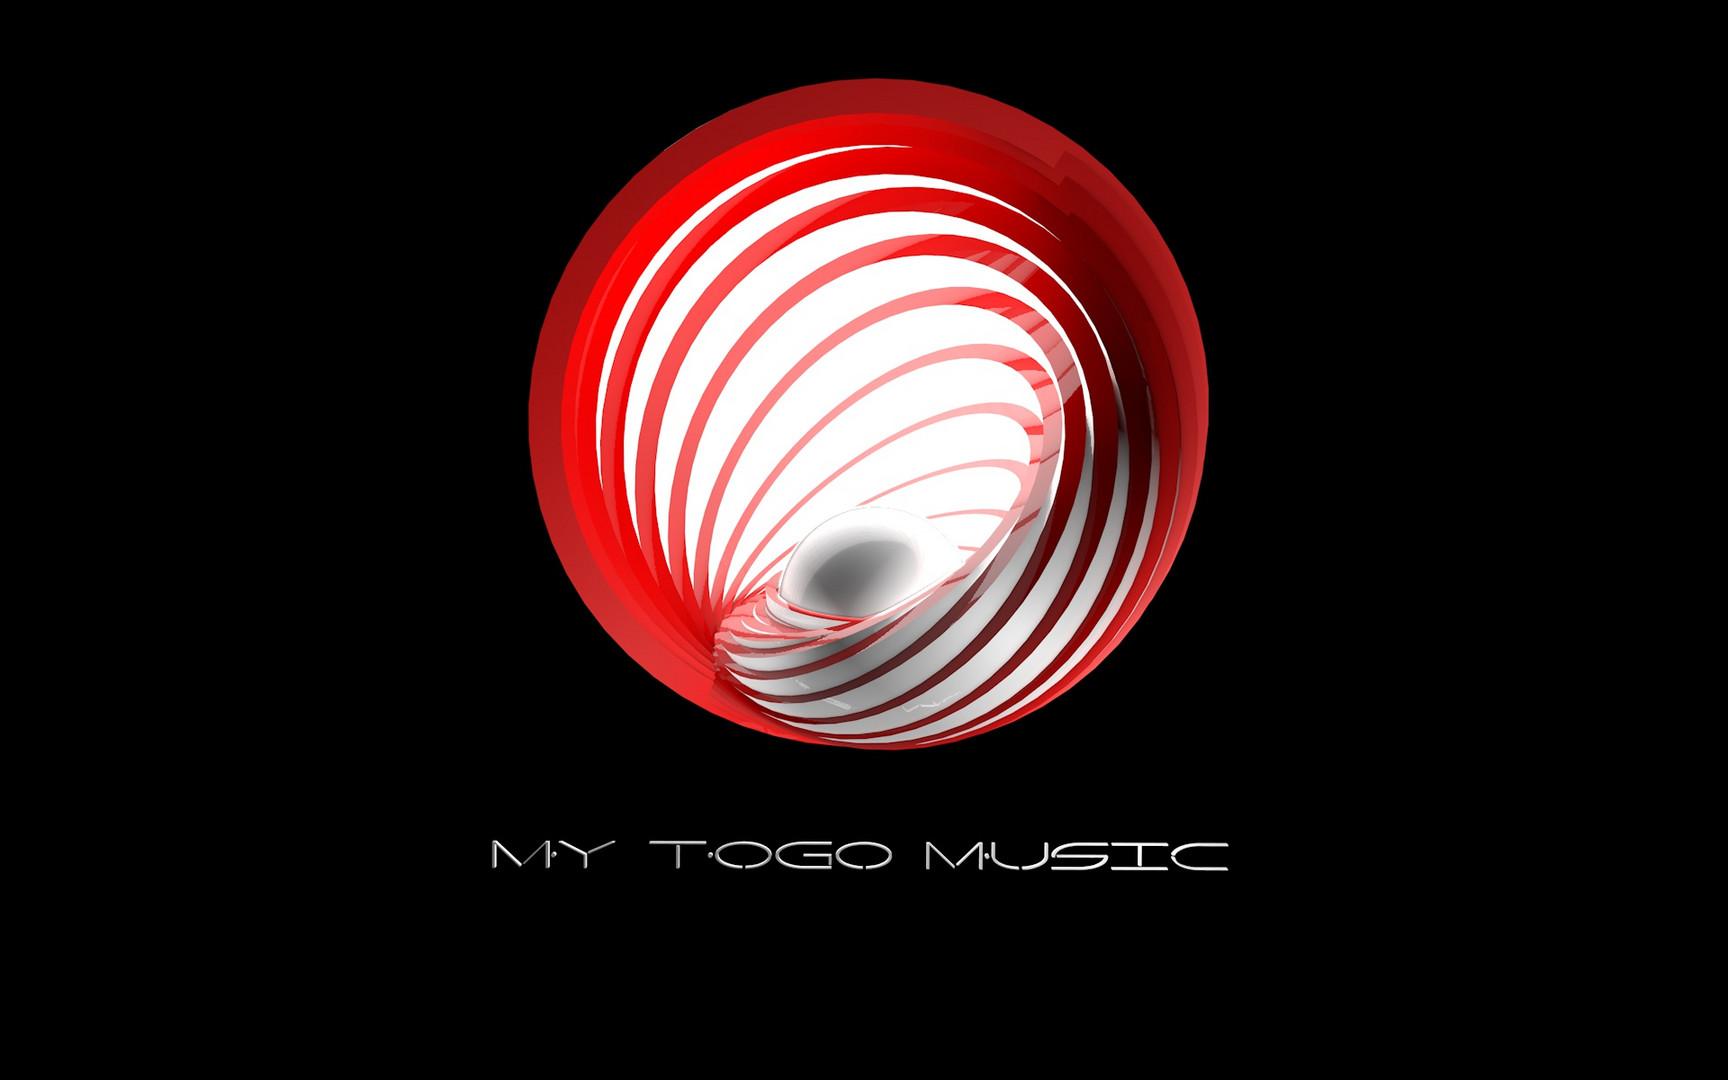 My Togo Music (Logo)